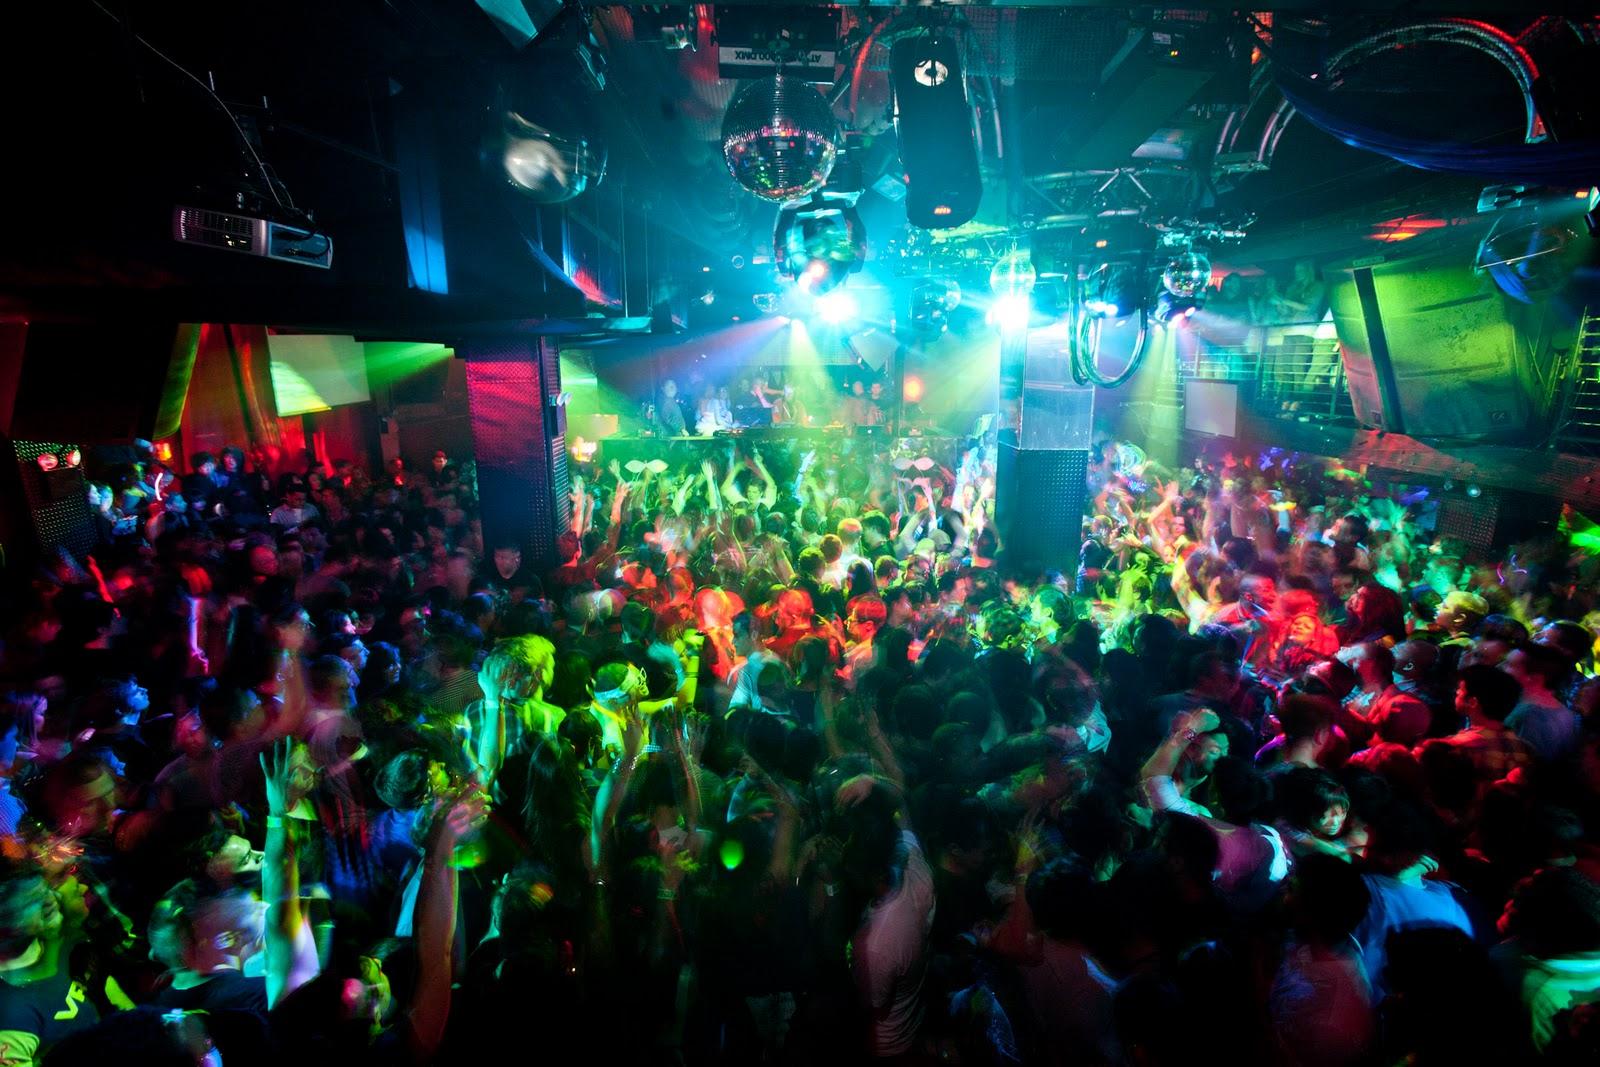 Nightclubs & Bars